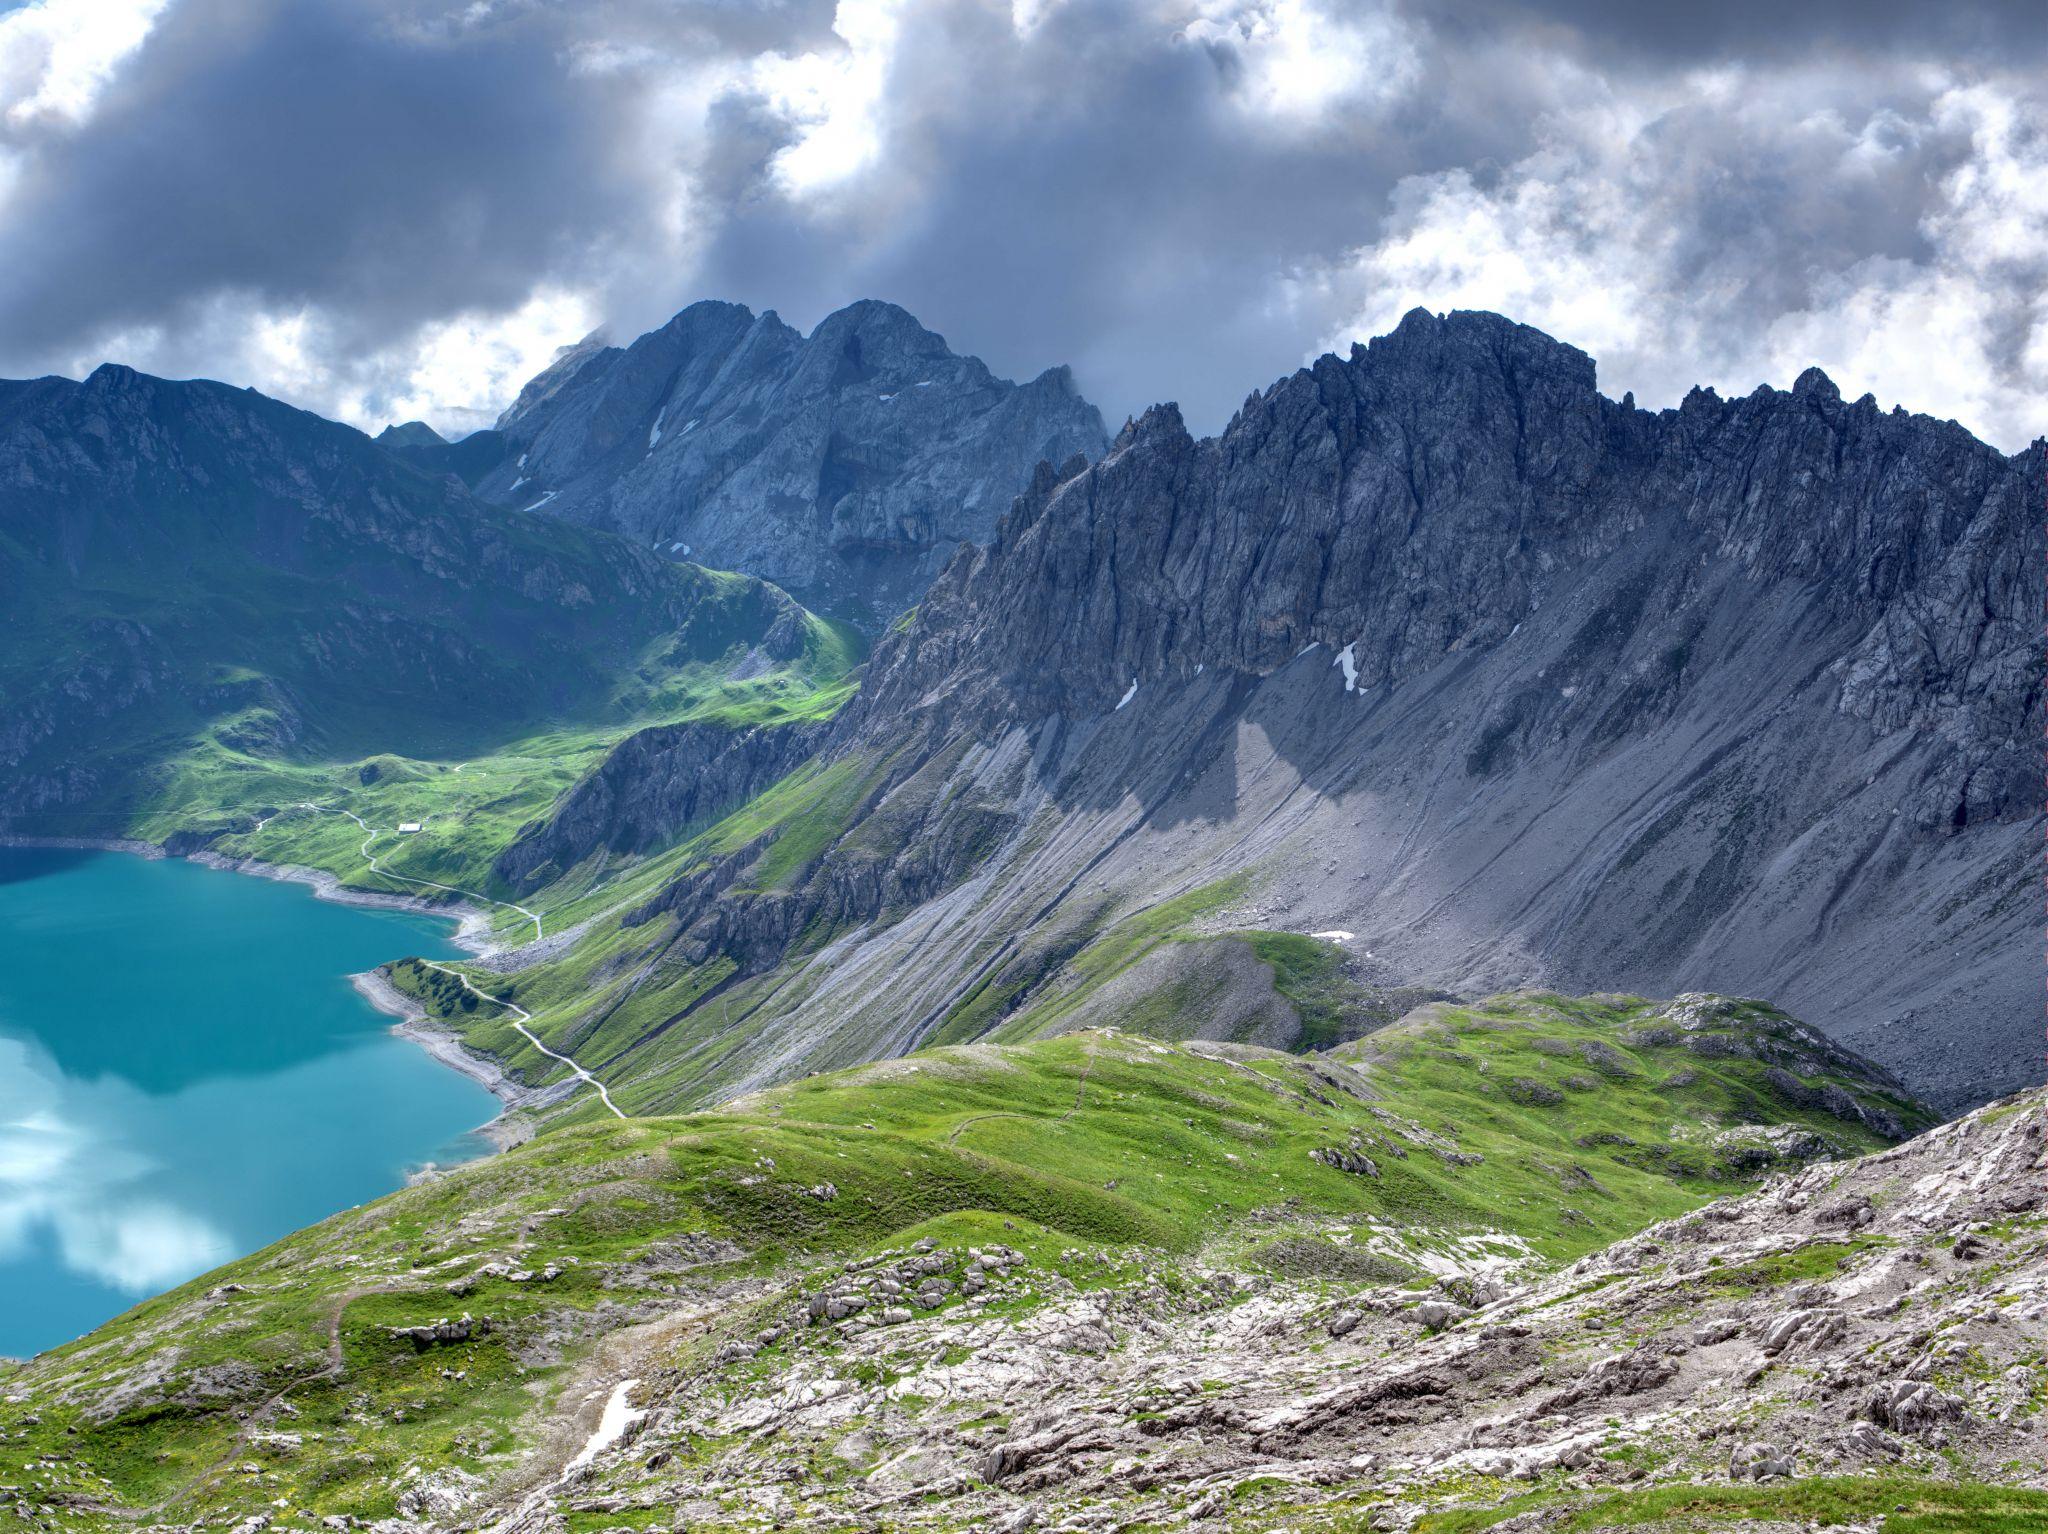 Panorama Overview, Austria